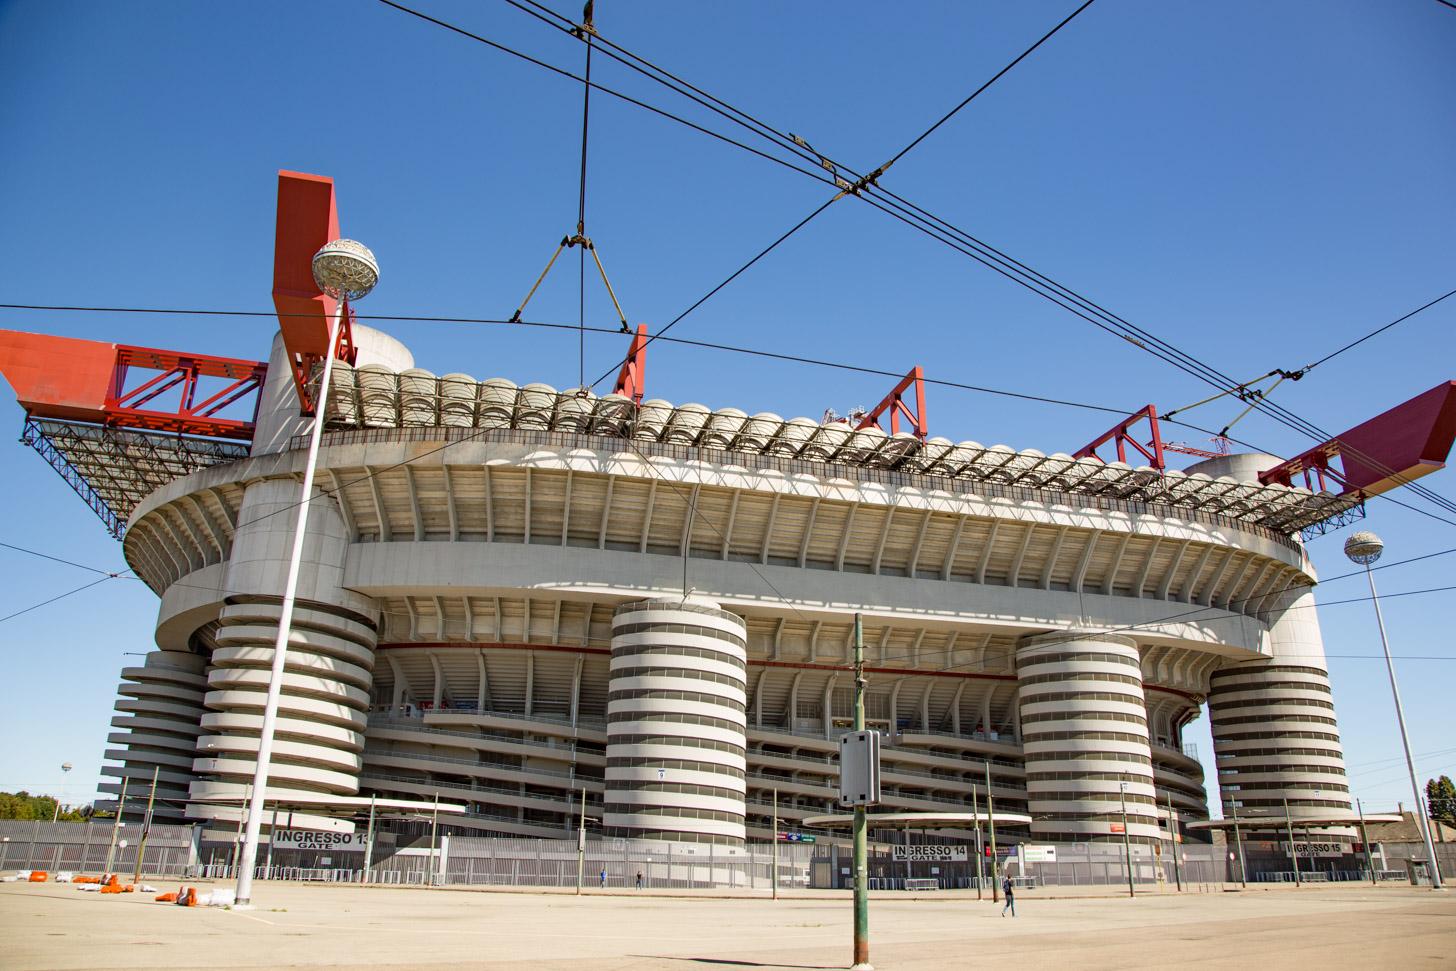 Het San Siro stadion in Milaan.